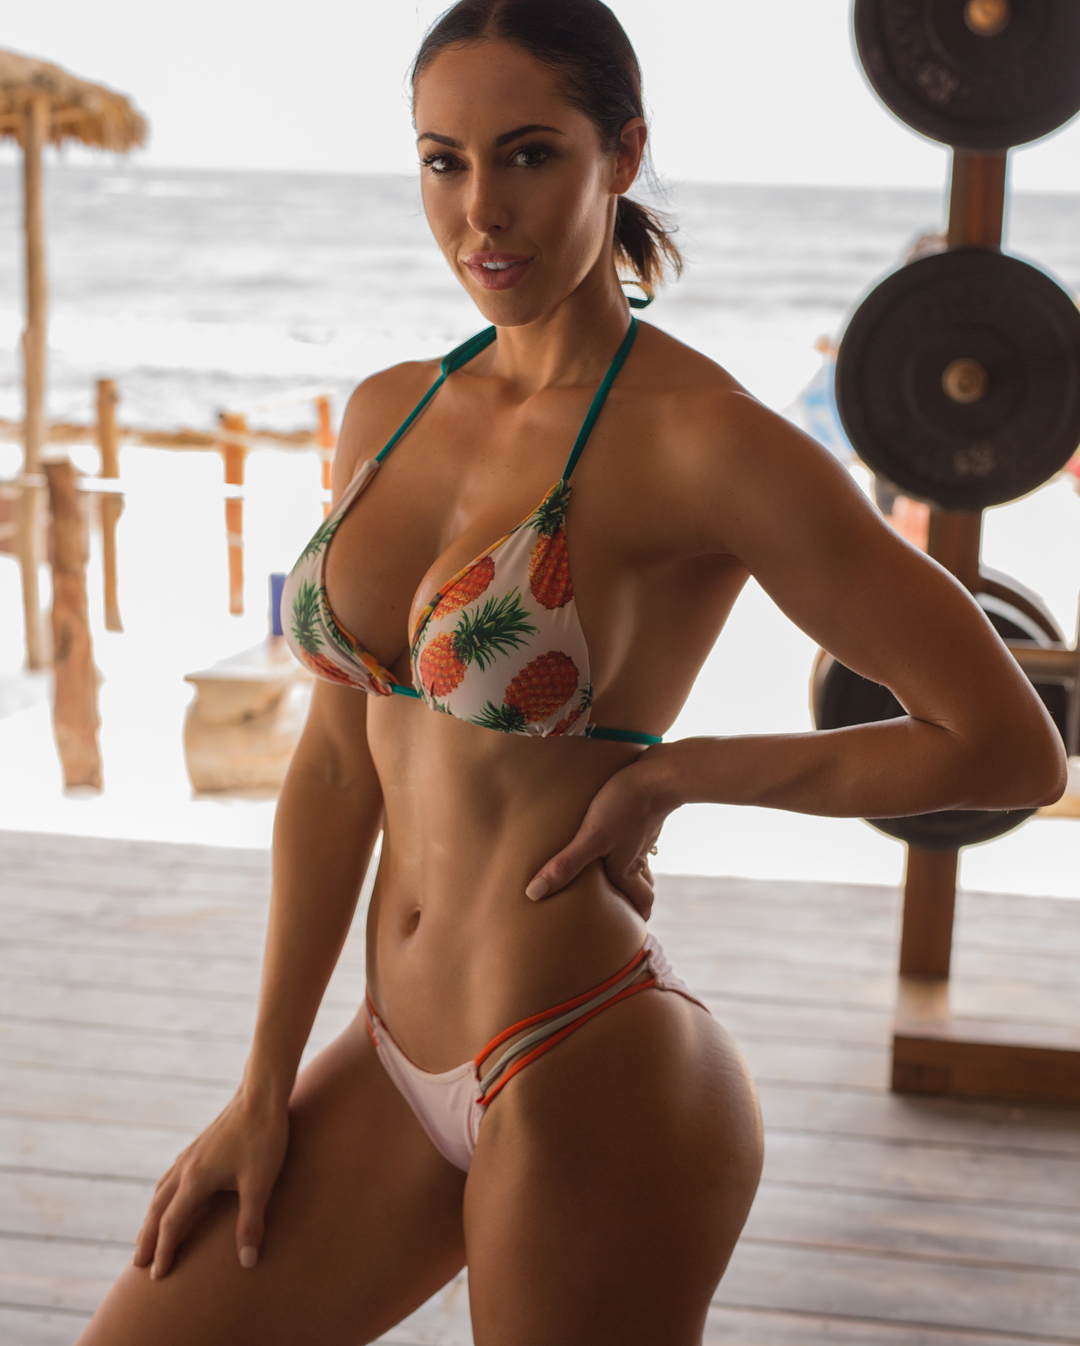 Photos Hope Beel nudes (49 foto and video), Topless, Fappening, Instagram, in bikini 2018